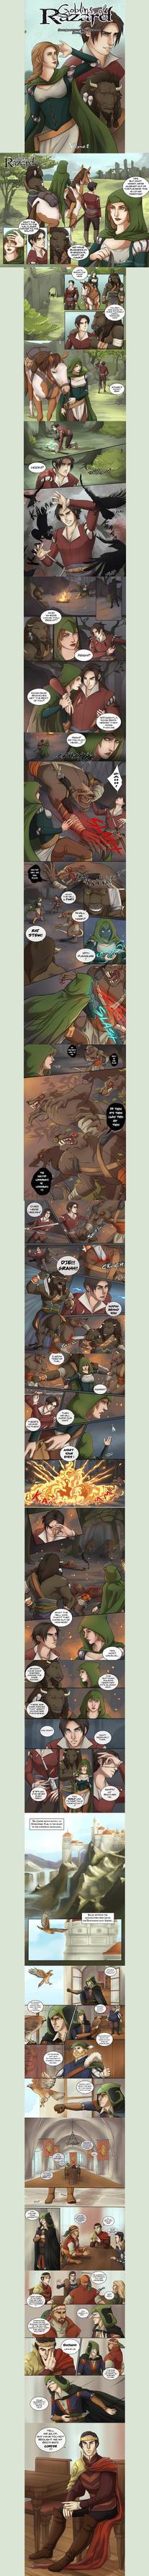 Goblins of Razard - Chapter 2 by ladyarrowsmith